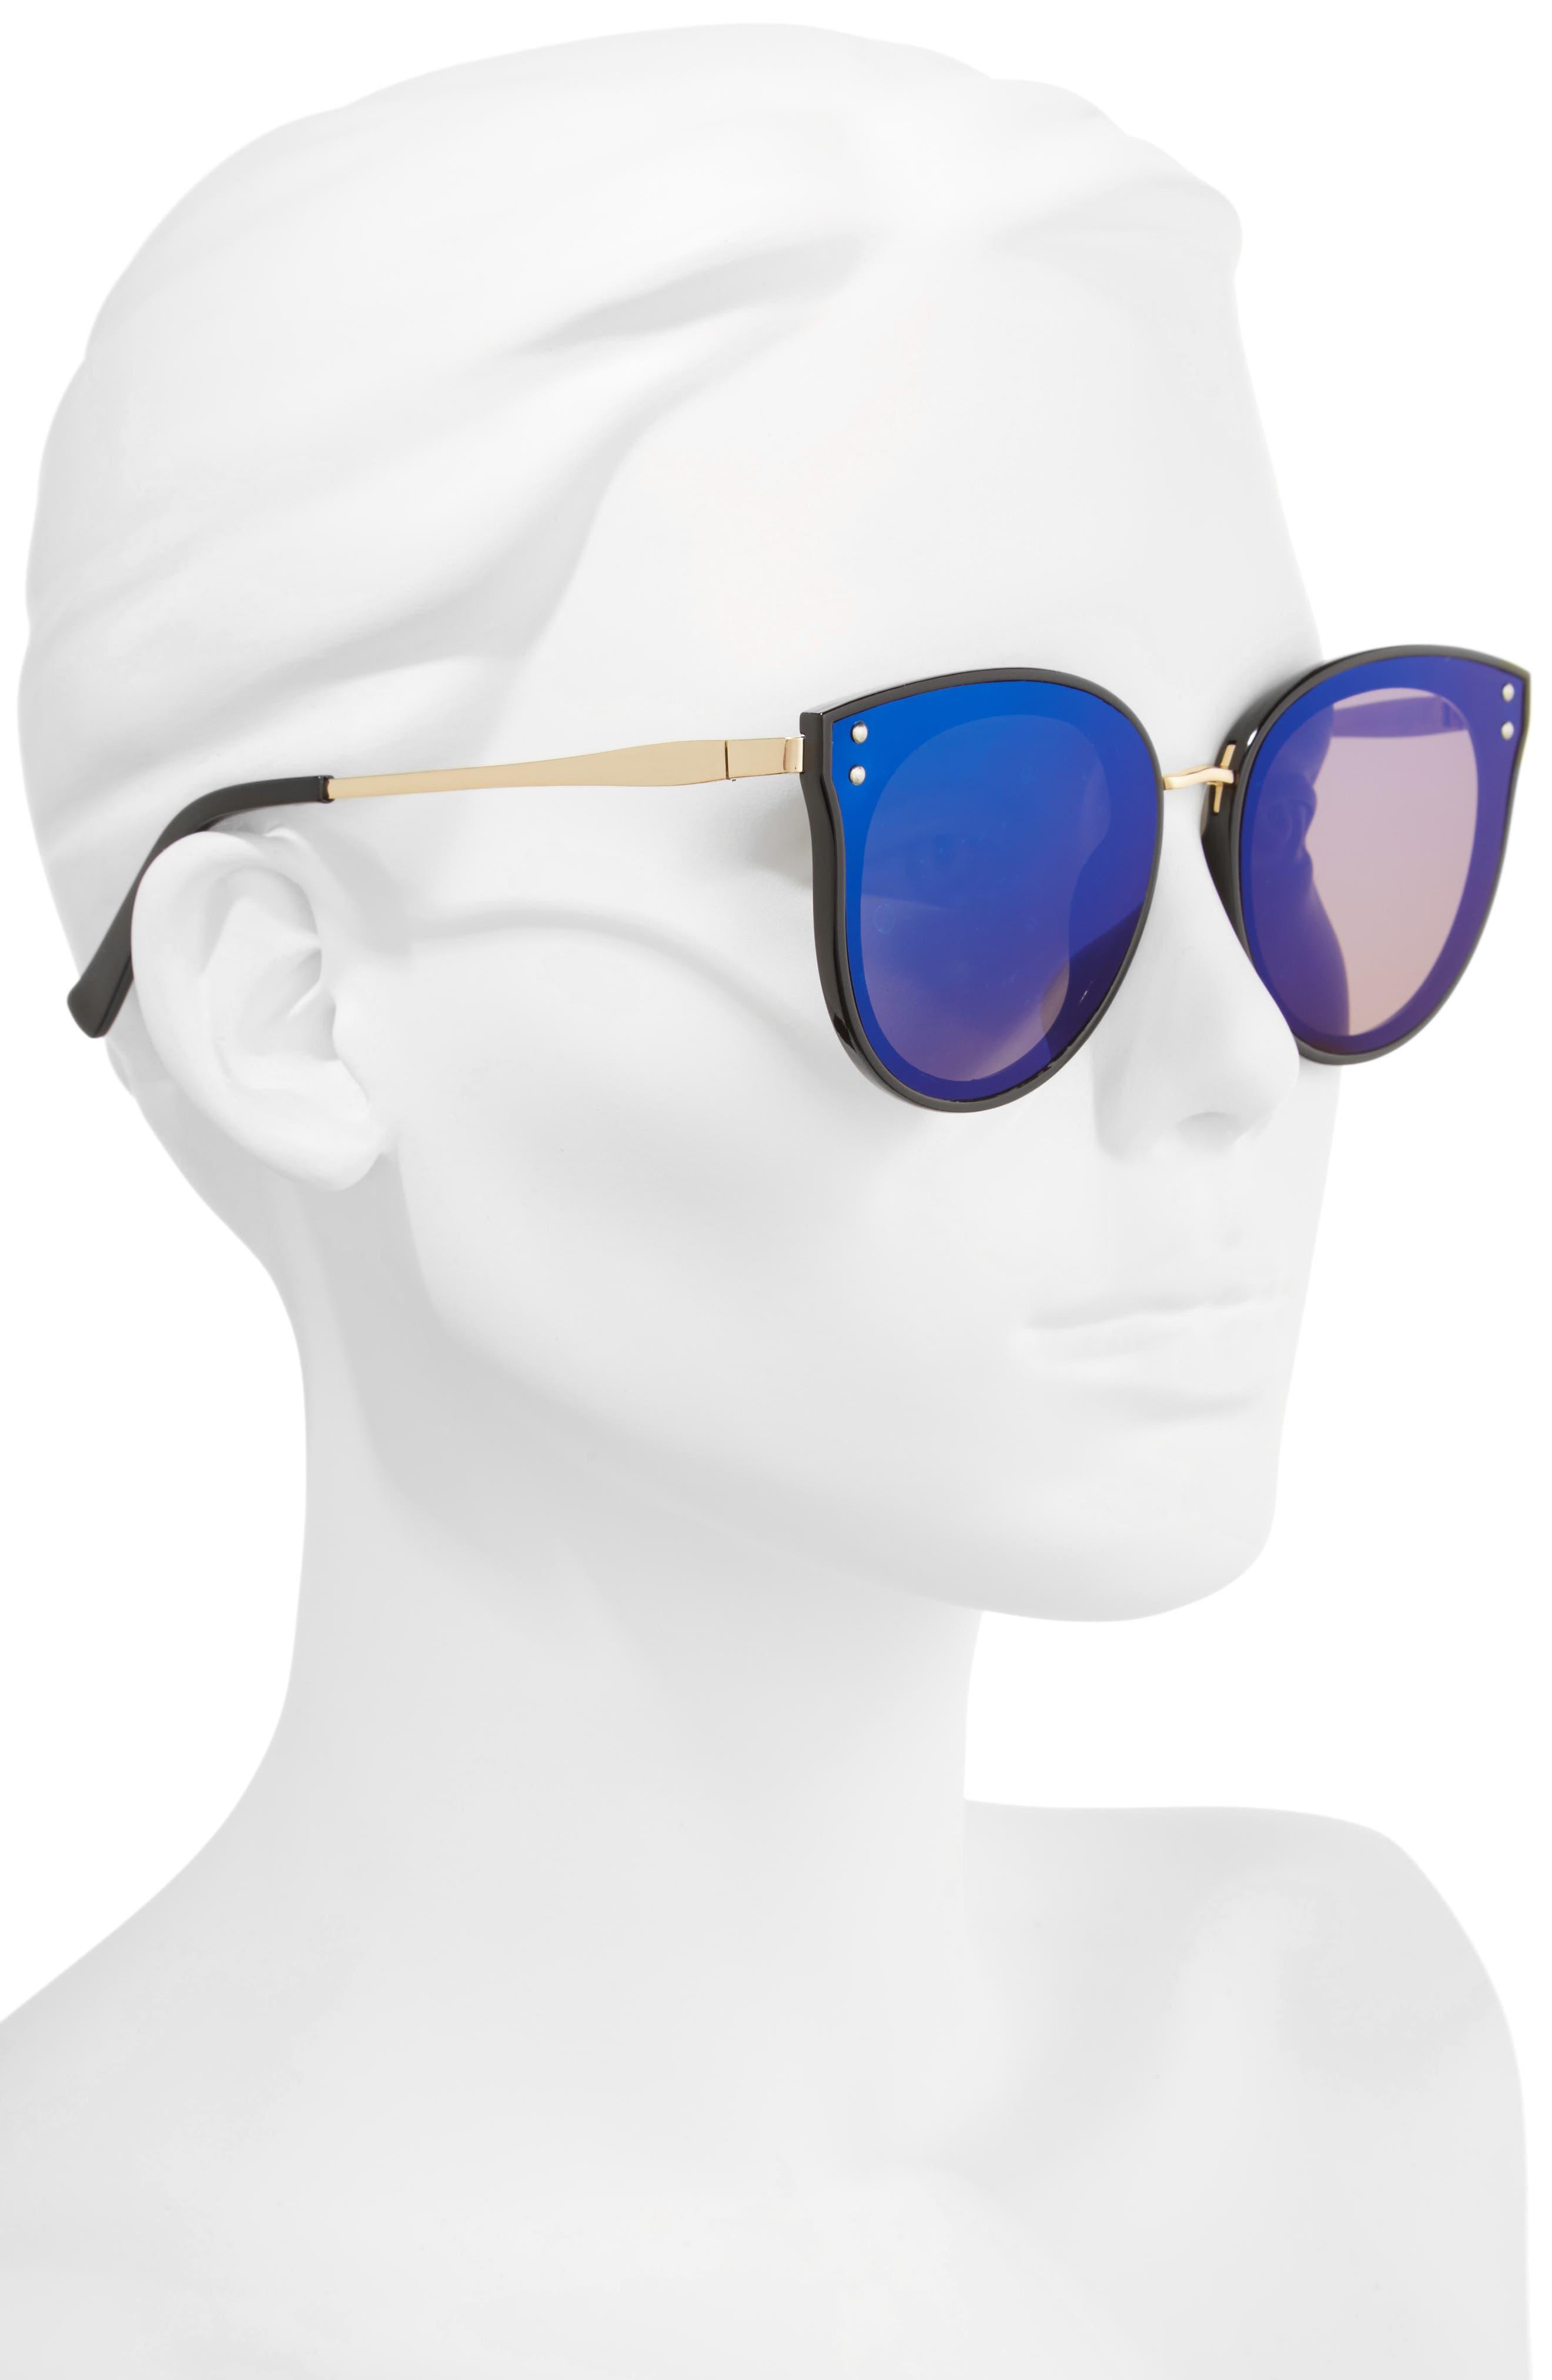 51mm Round Sunglasses,                             Alternate thumbnail 2, color,                             Black/ Blue